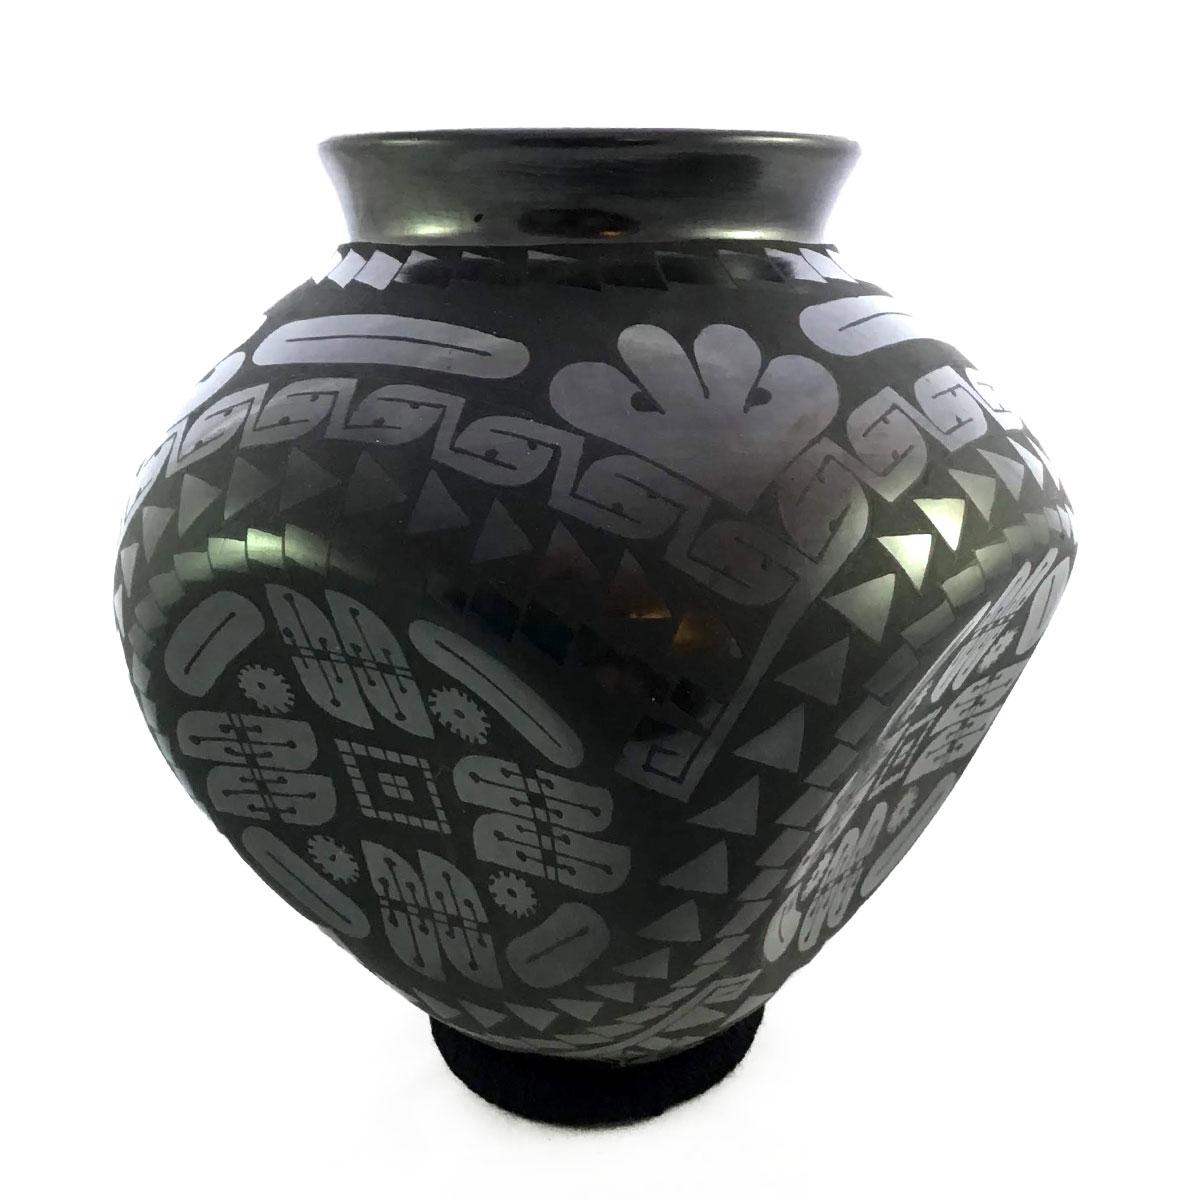 "Eduardo ""Chevo"" Ortiz Eduardo ""Chevo"" Ortiz: Collector Large Concave-sided Pot Concave"